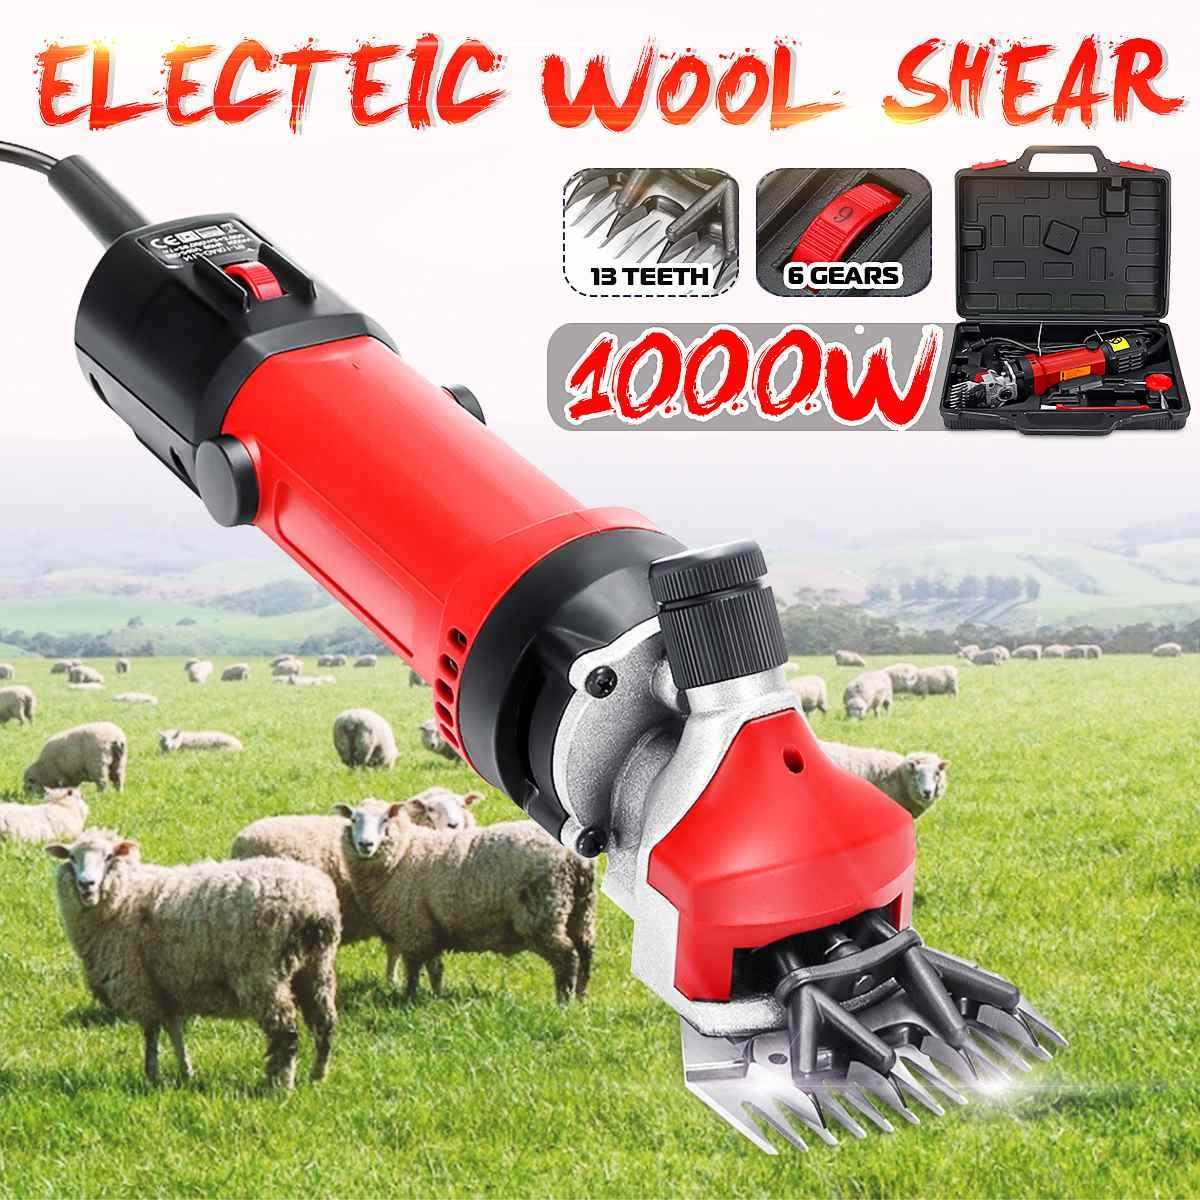 690W 110V Electric Shearing Clipper Animal Sheep Goat Pet Farm Machine DHL FAST